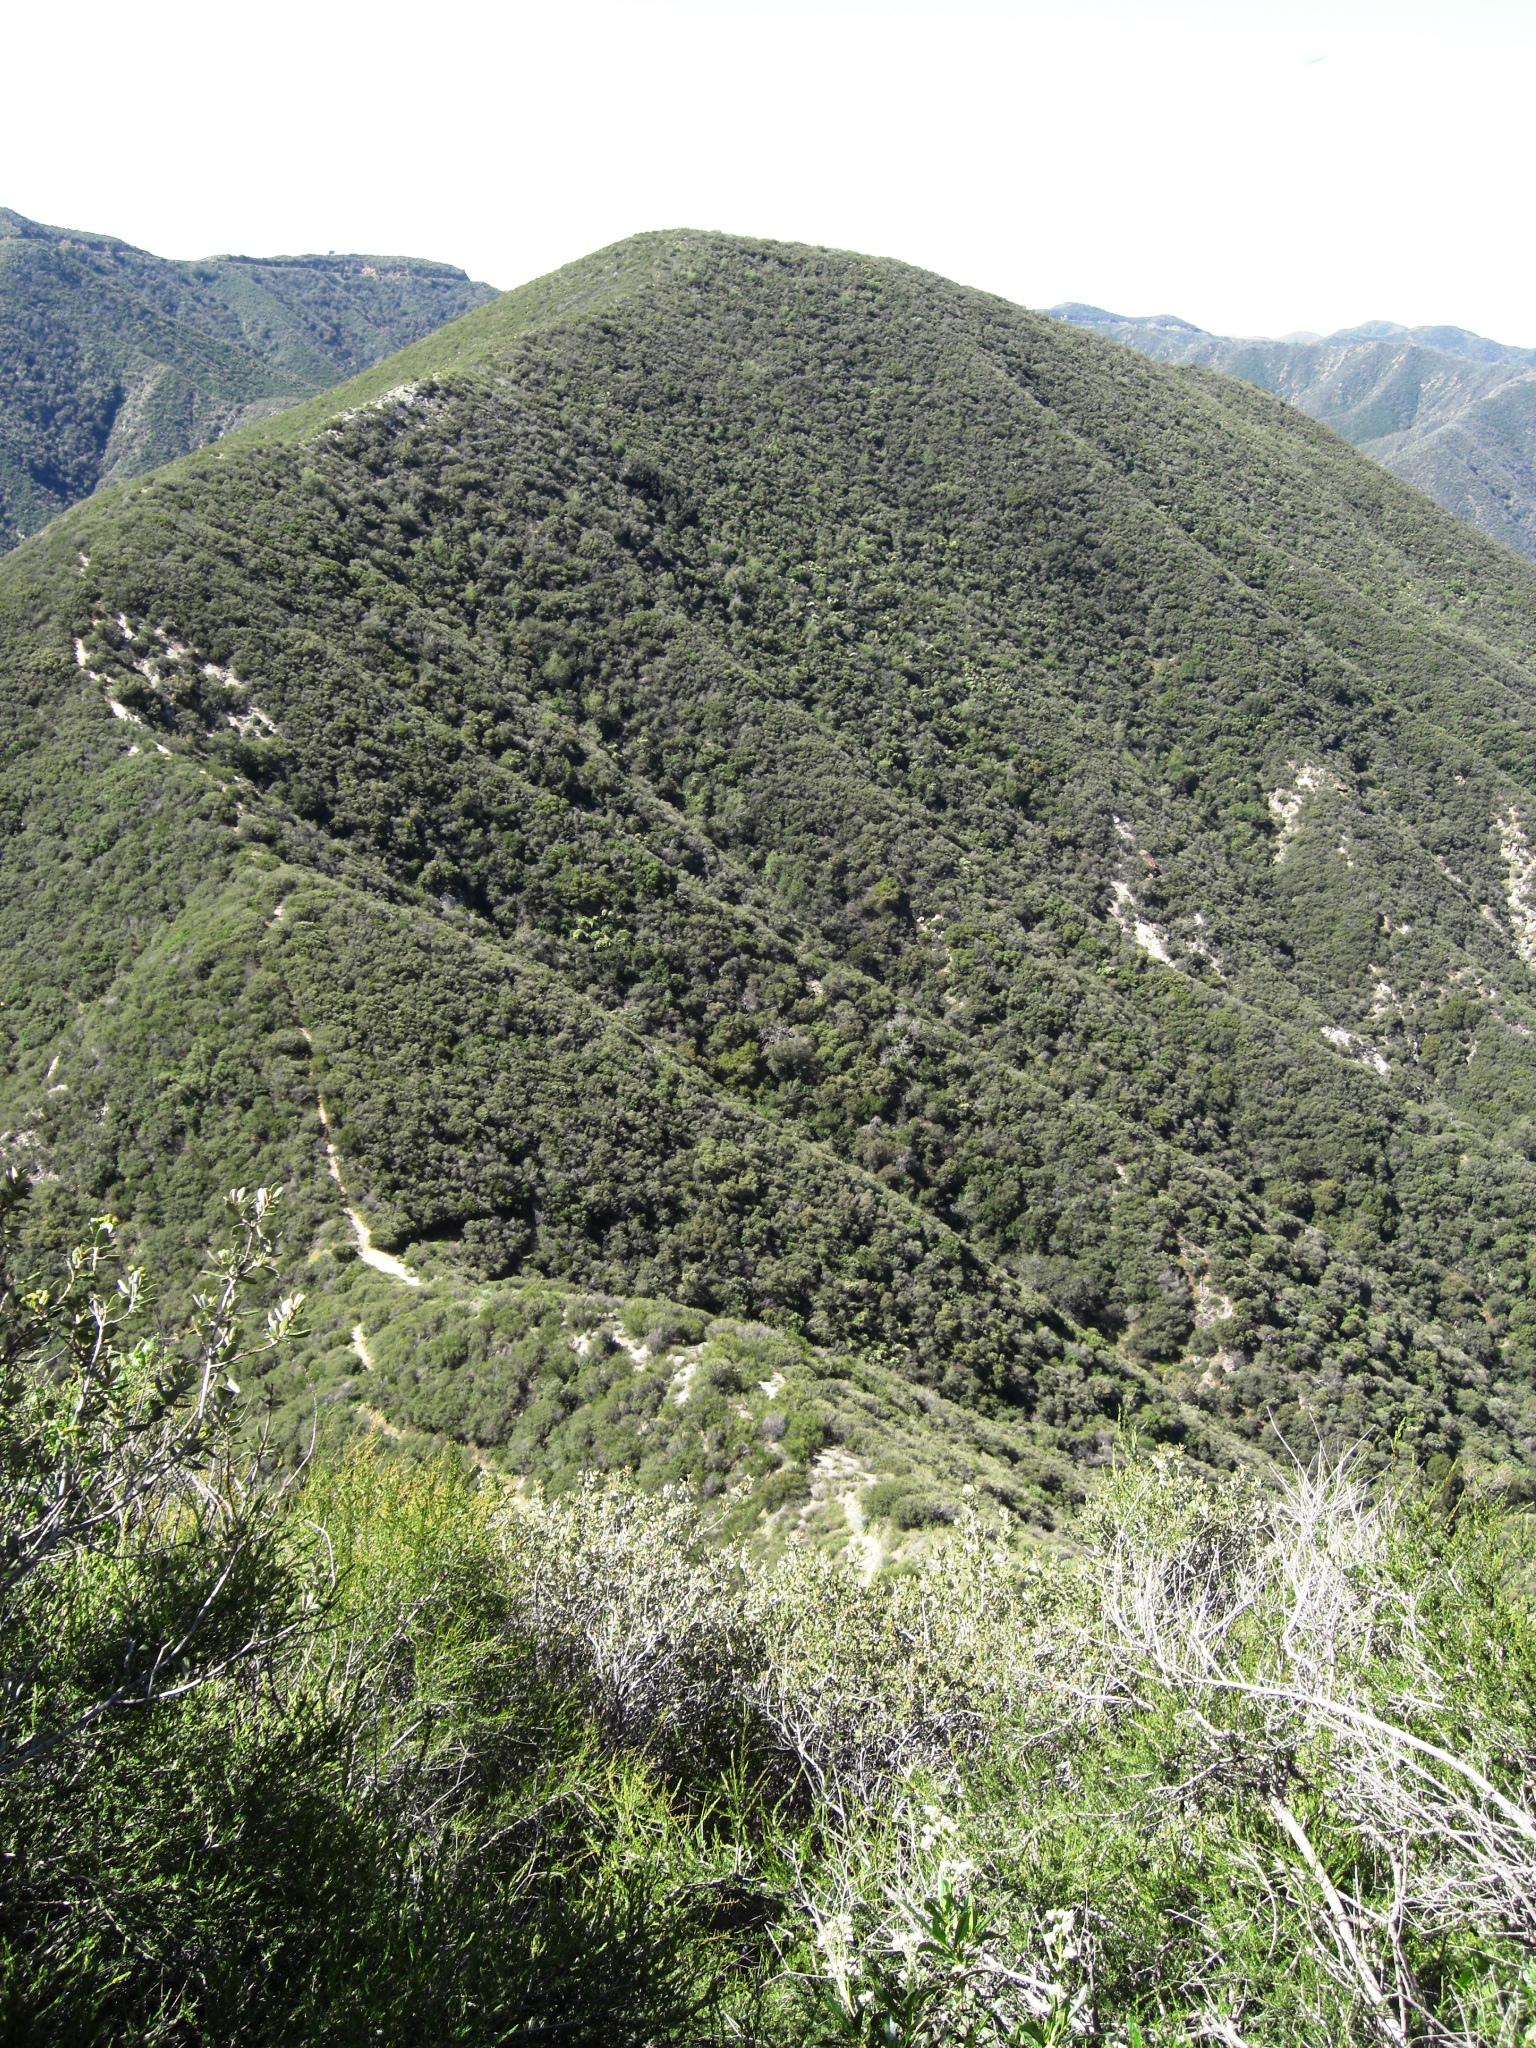 We love hiking ridgetop trails!